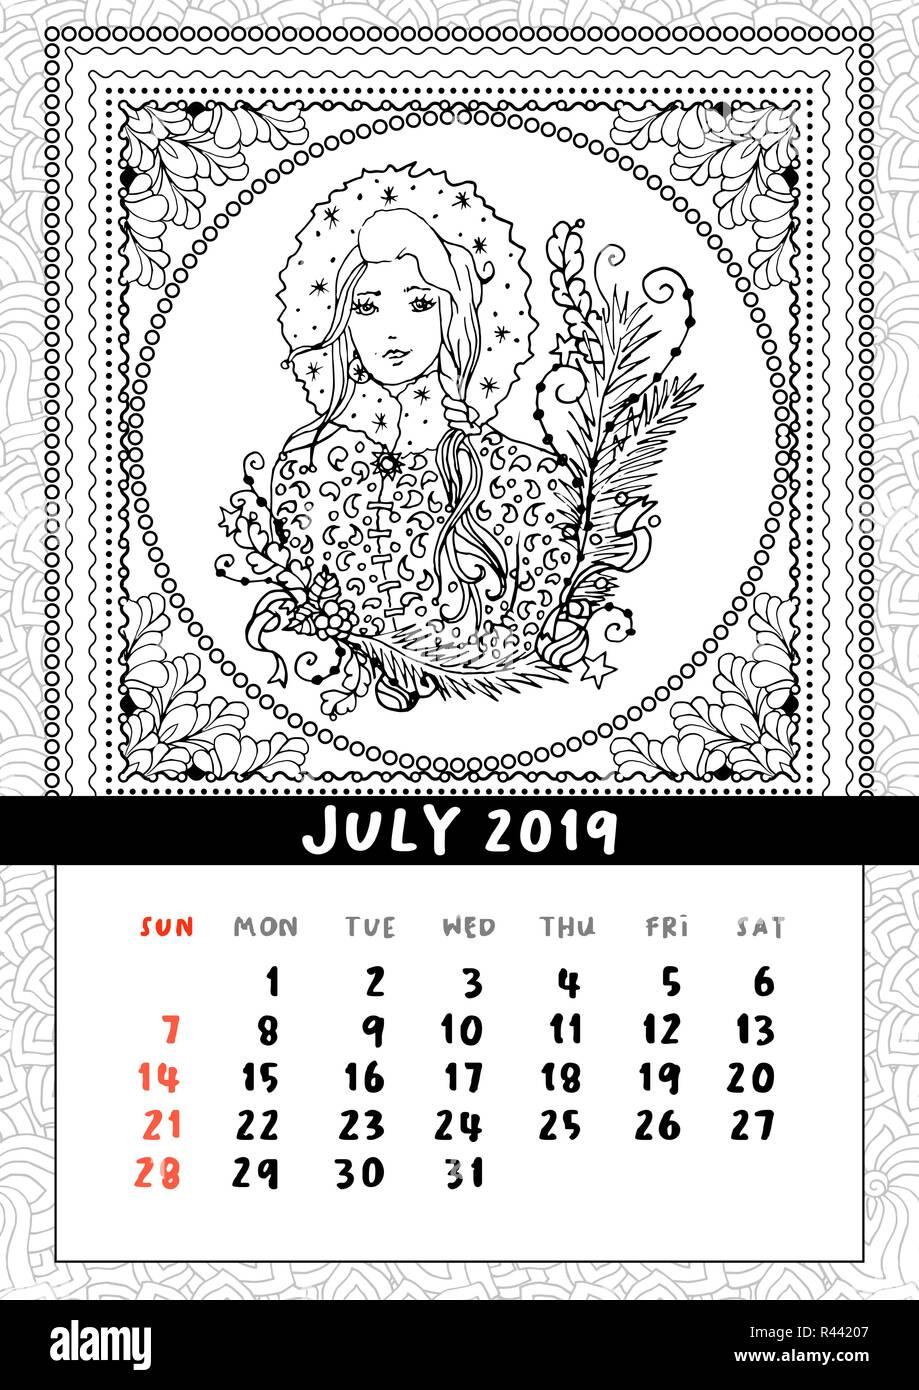 Calendario Mese Di Luglio 2019 Da Stampare.July 2019 Calendar Immagini July 2019 Calendar Fotos Stock